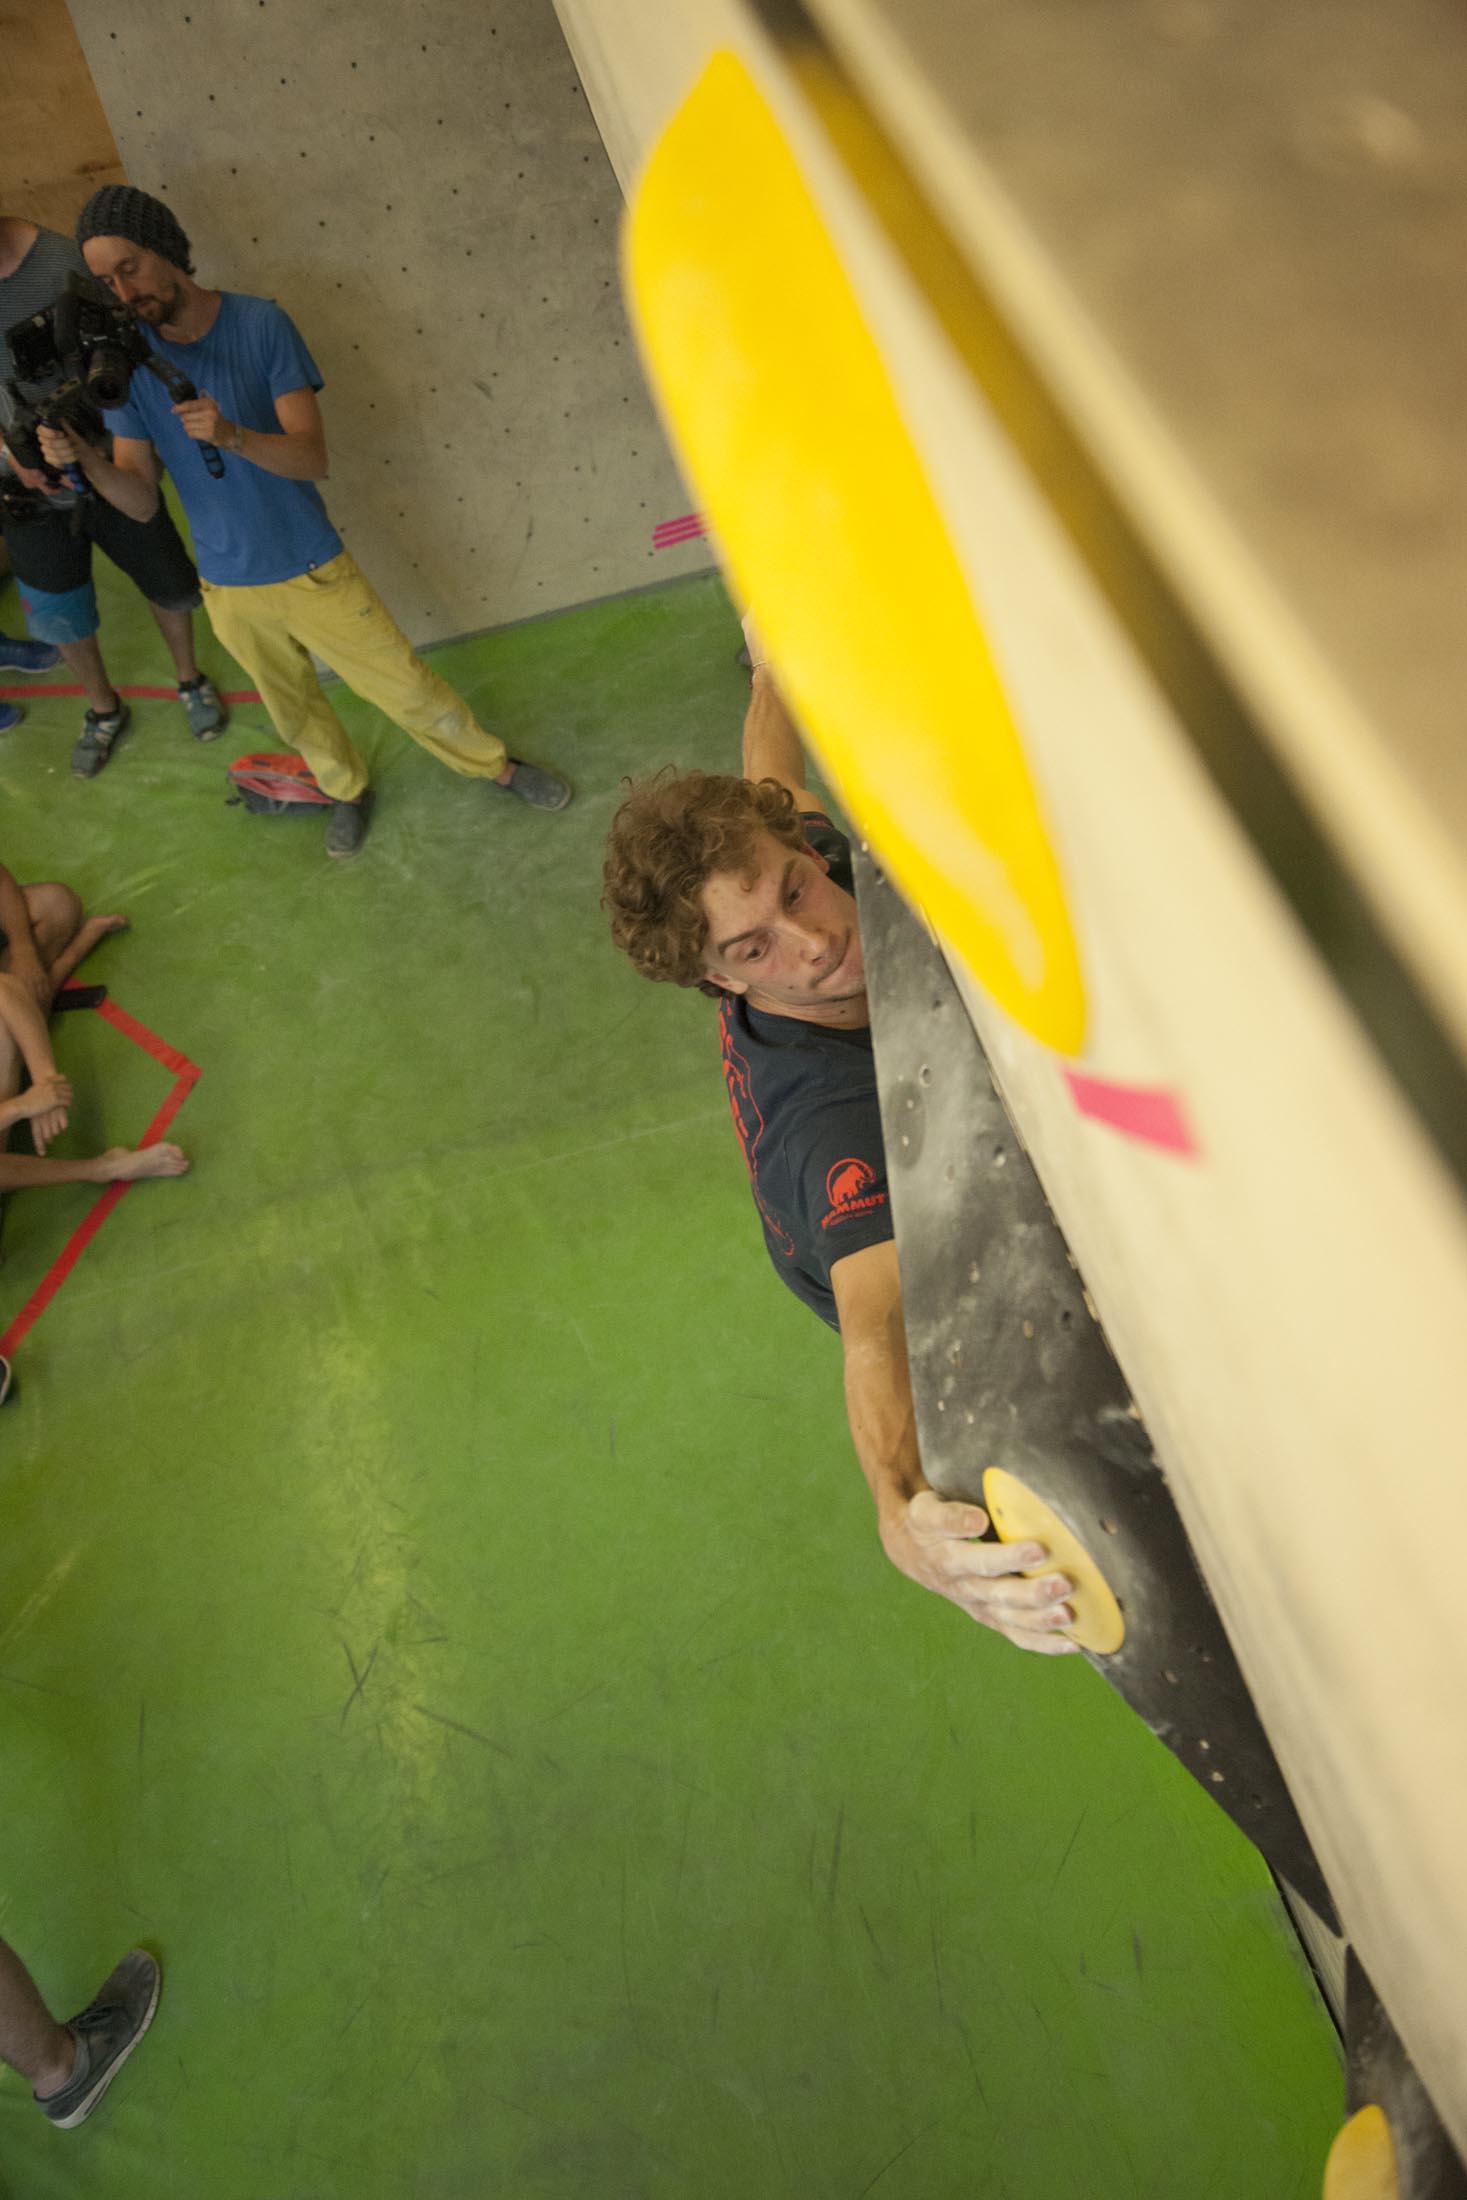 Finale, internationaler bouldercup Frankenjura 2016, BLOCKHELDEN Erlangen, Mammut, Bergfreunde.de, Boulderwettkampf07092016572